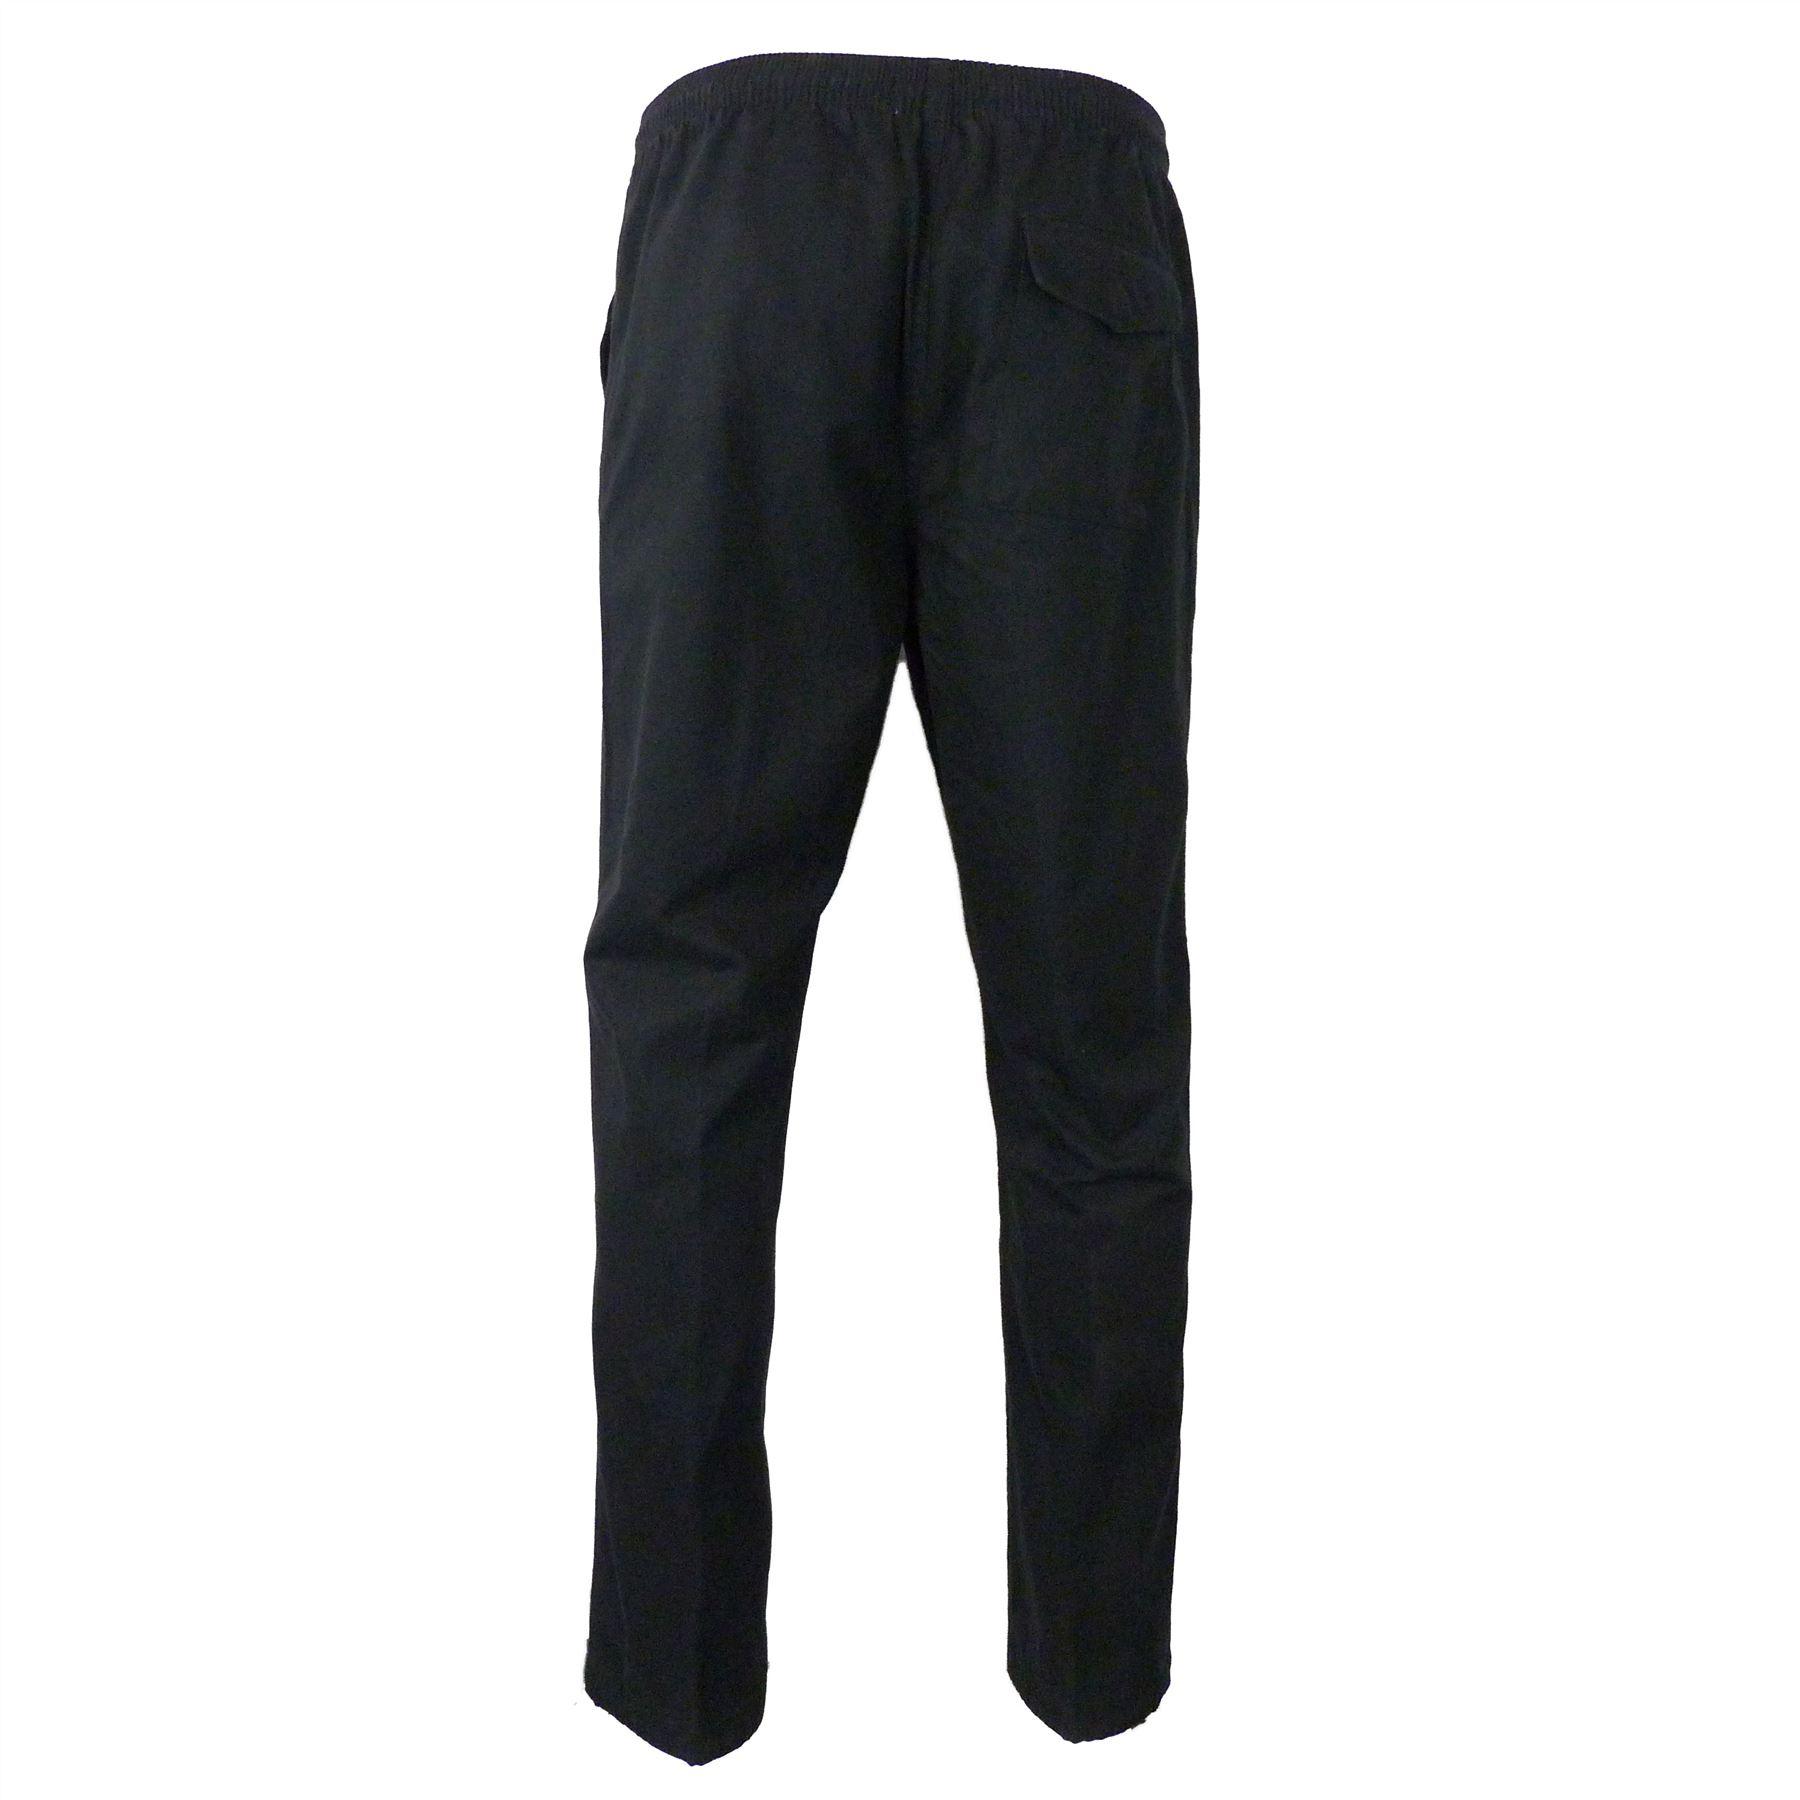 Ex-M-amp-S-Marks-and-Spencer-Coleccion-Regular-Fit-puro-algodon-Chinos-Pantalones miniatura 3